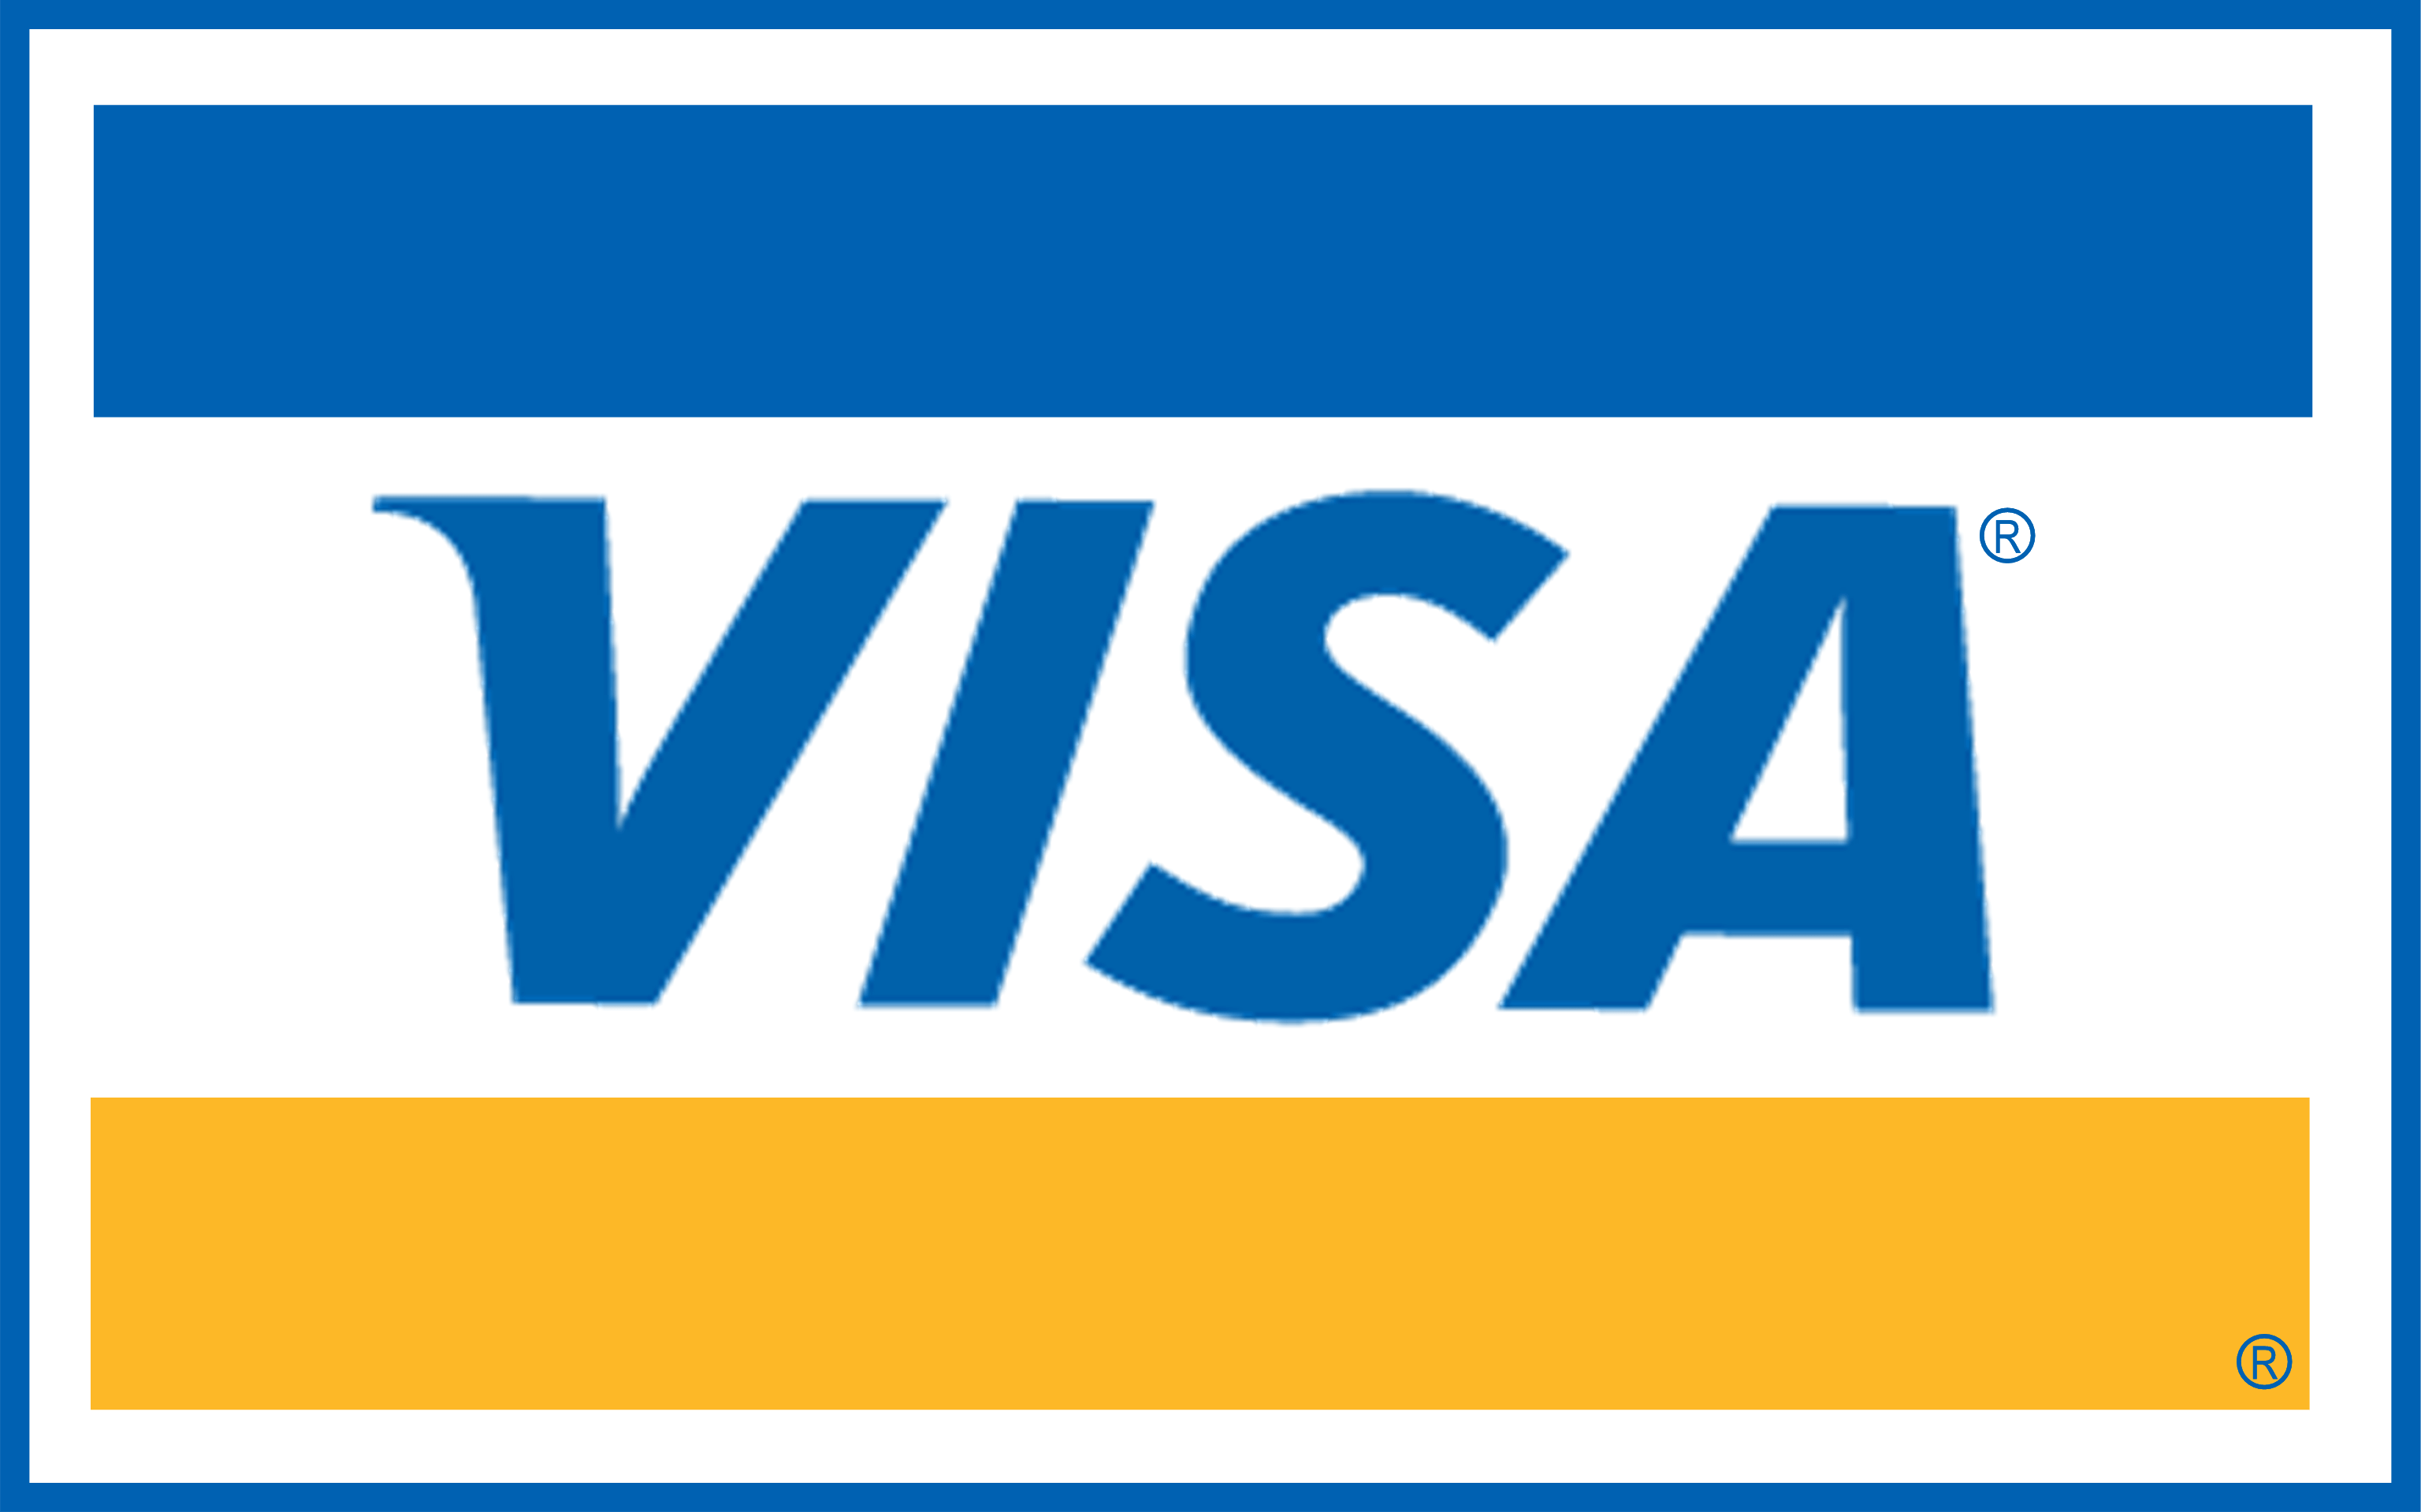 Visa bankkártya